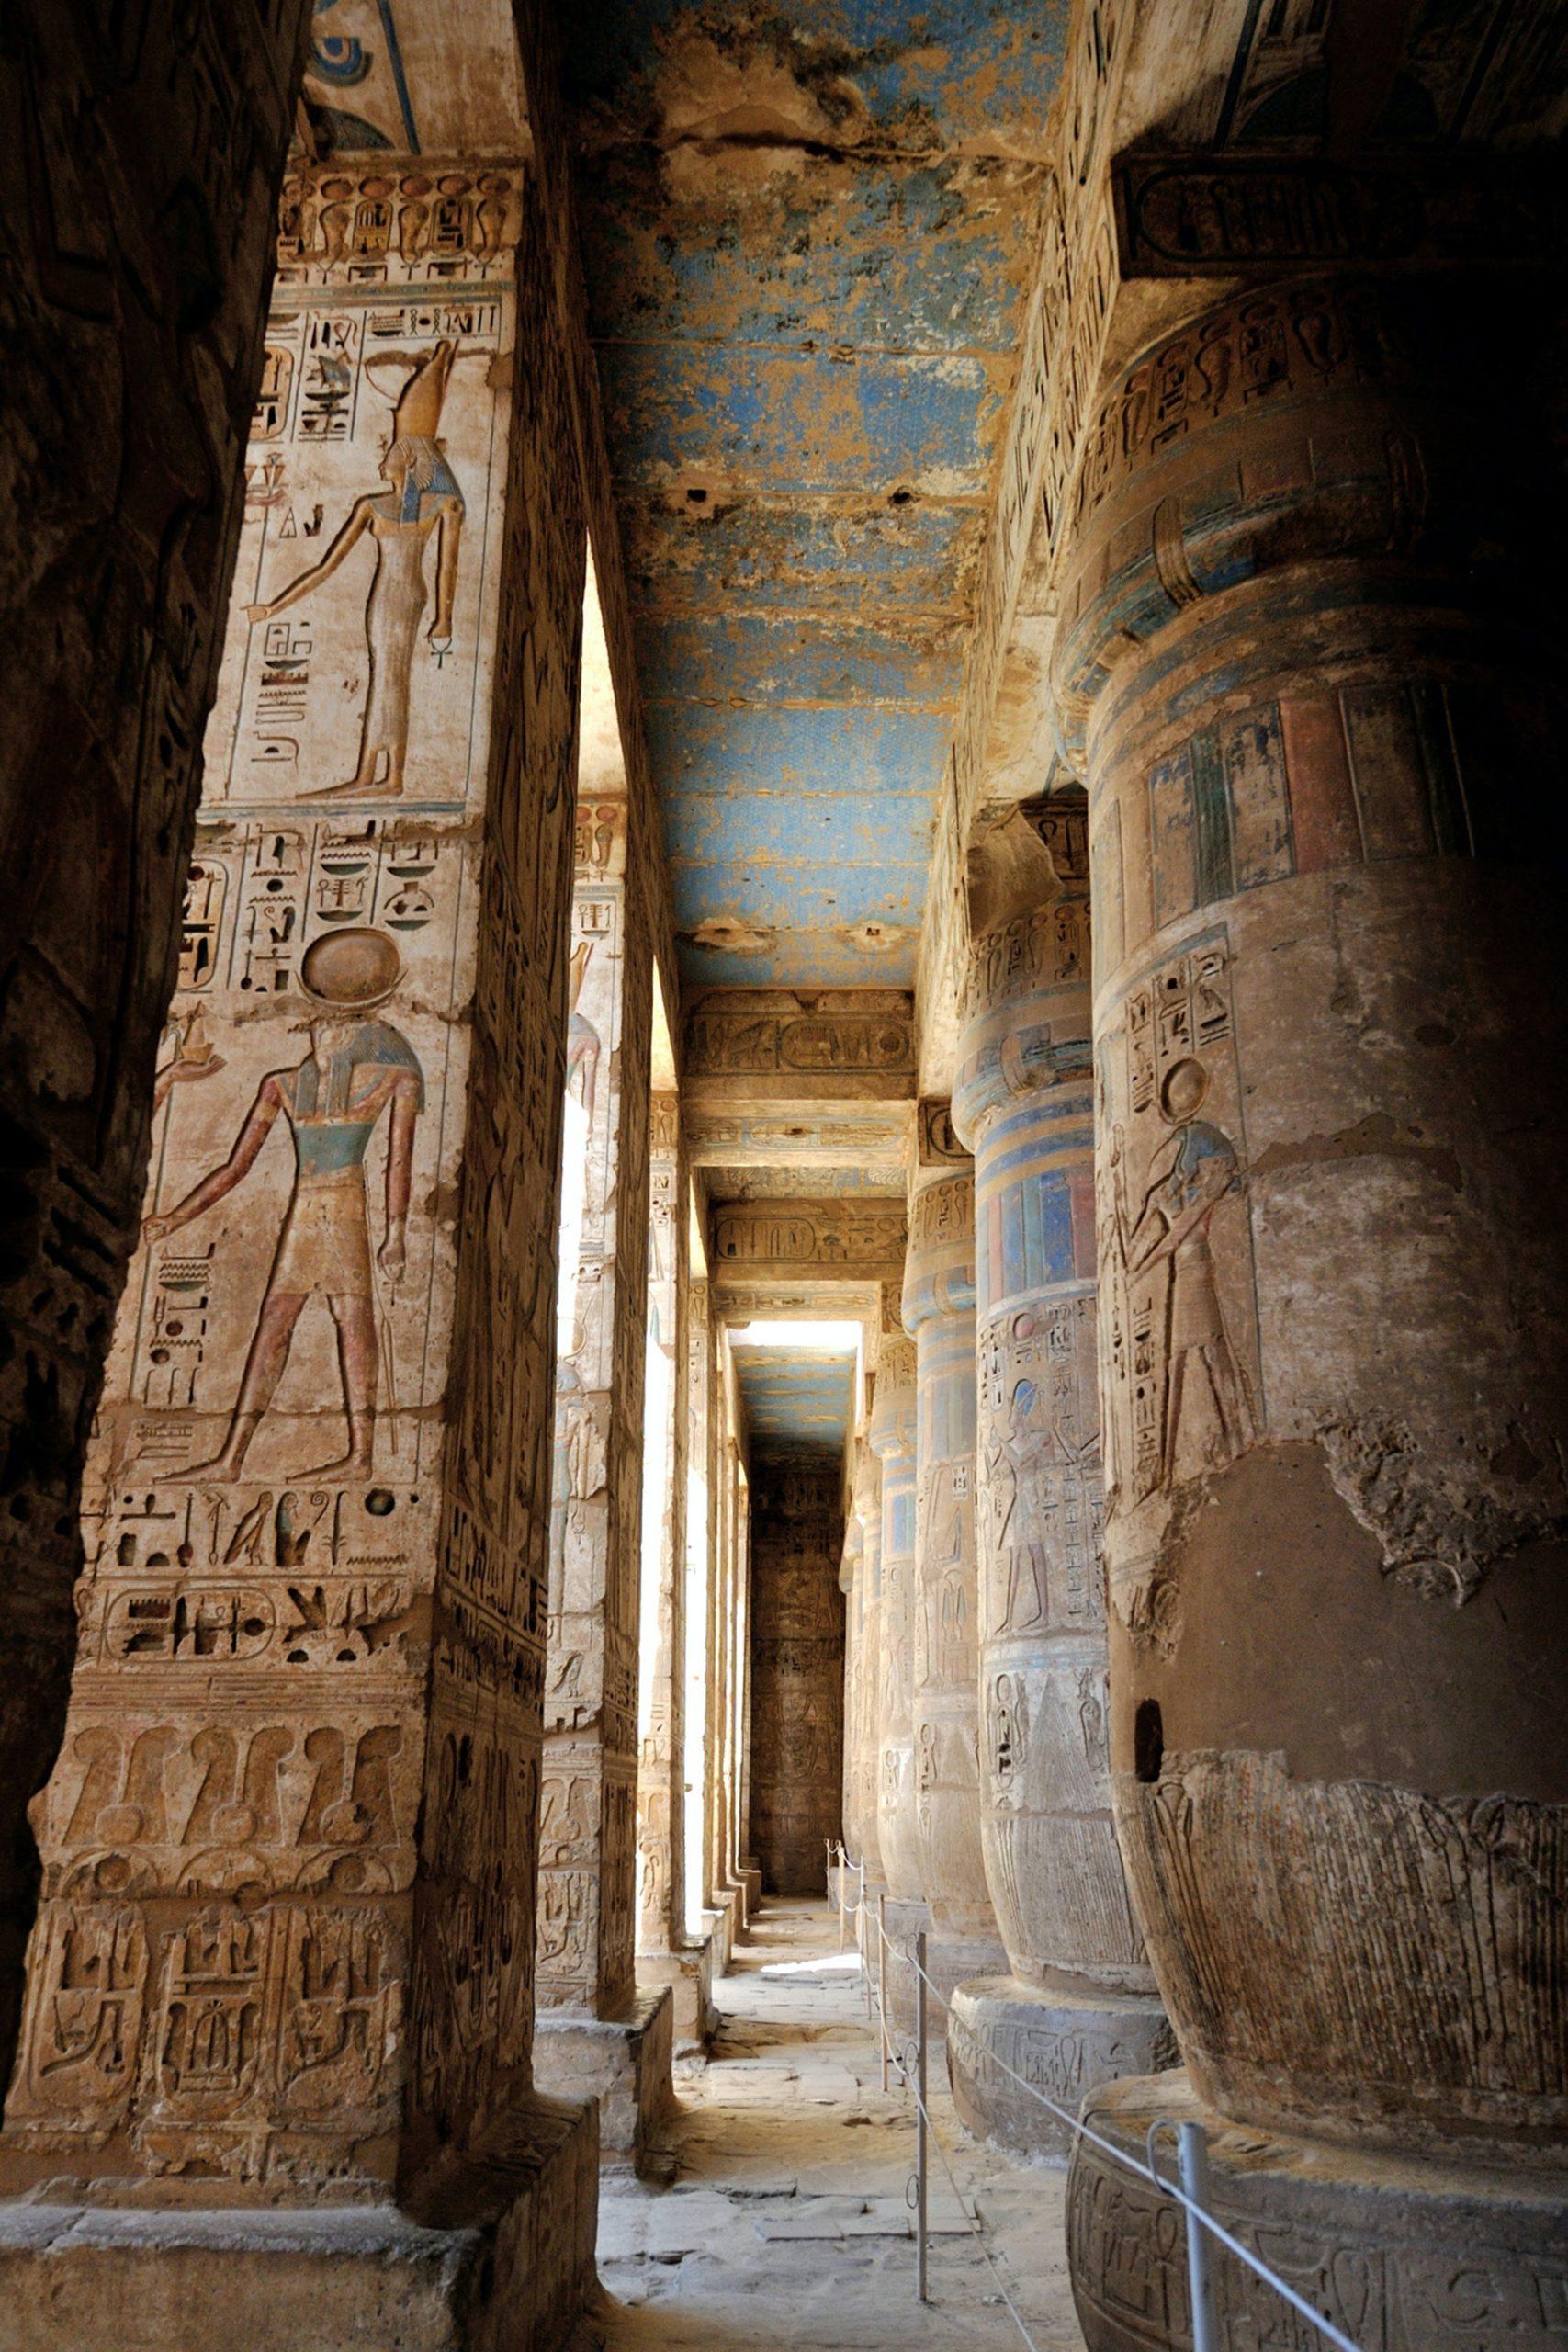 Viaje a Egipto - The Indiana Travel Experiences37